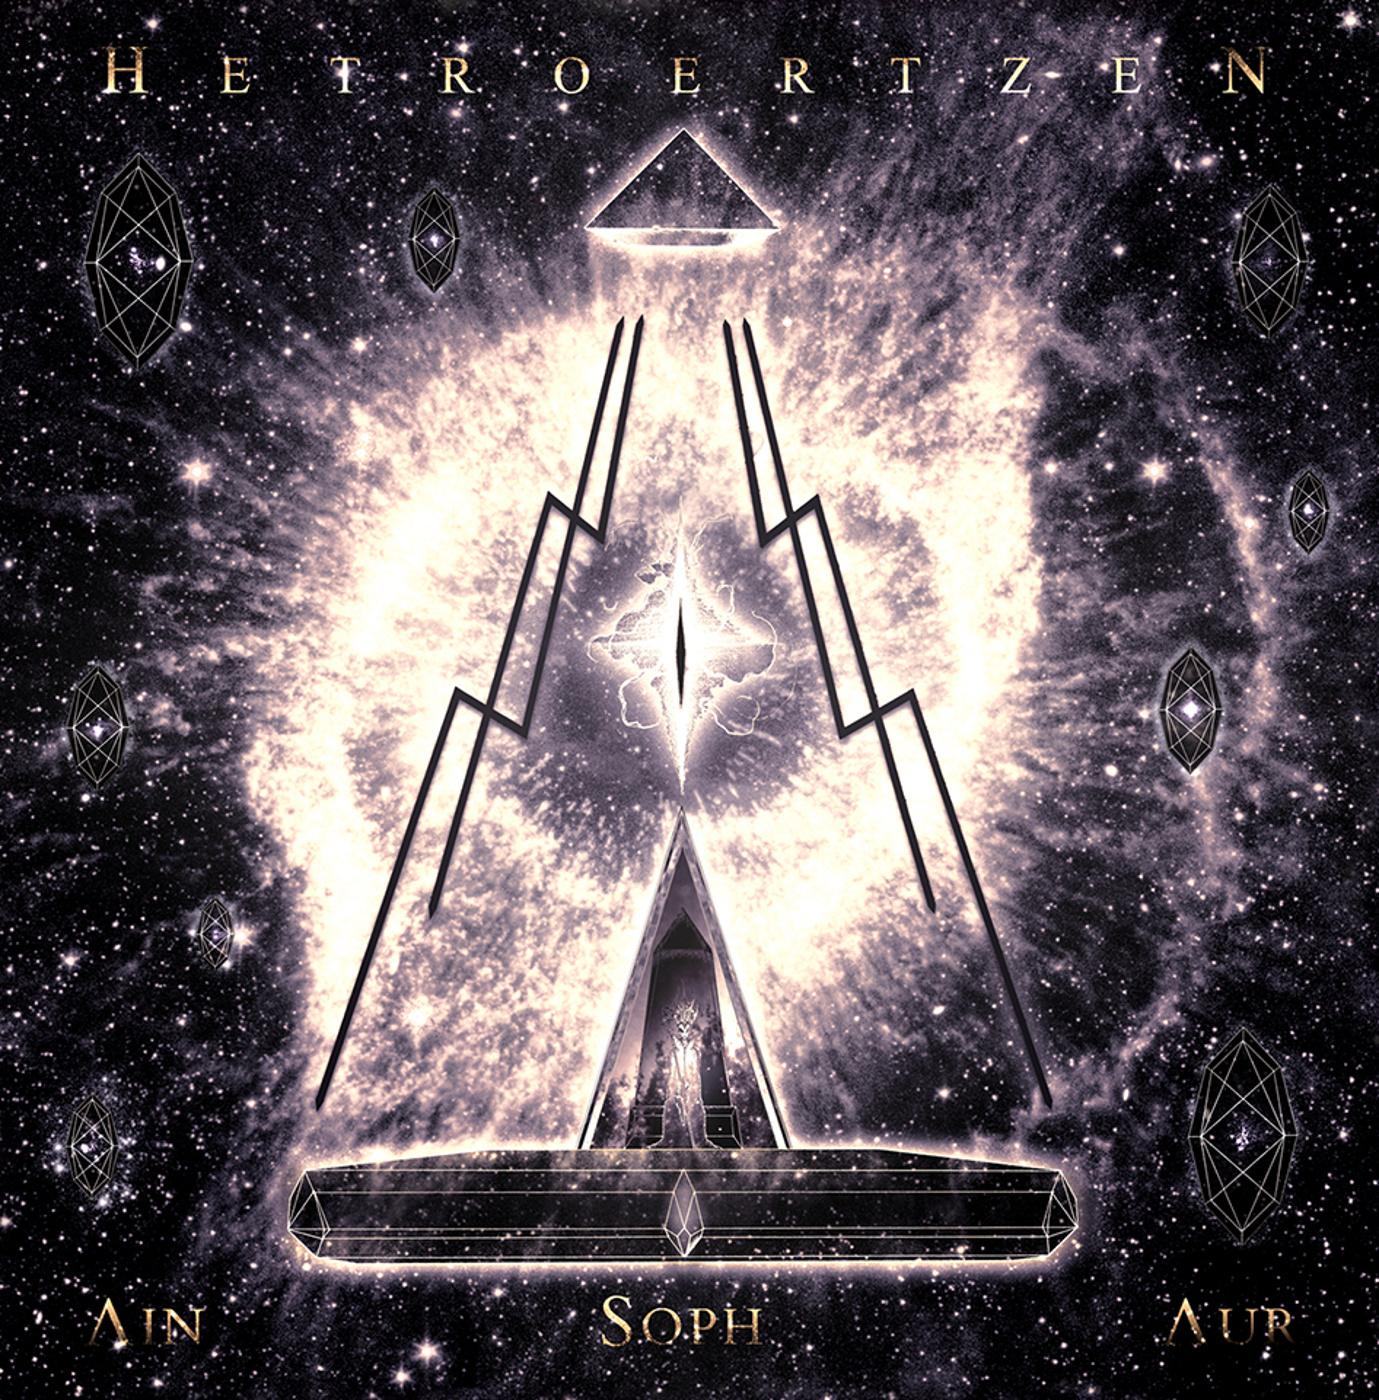 Ain-Soph-Aur-cover